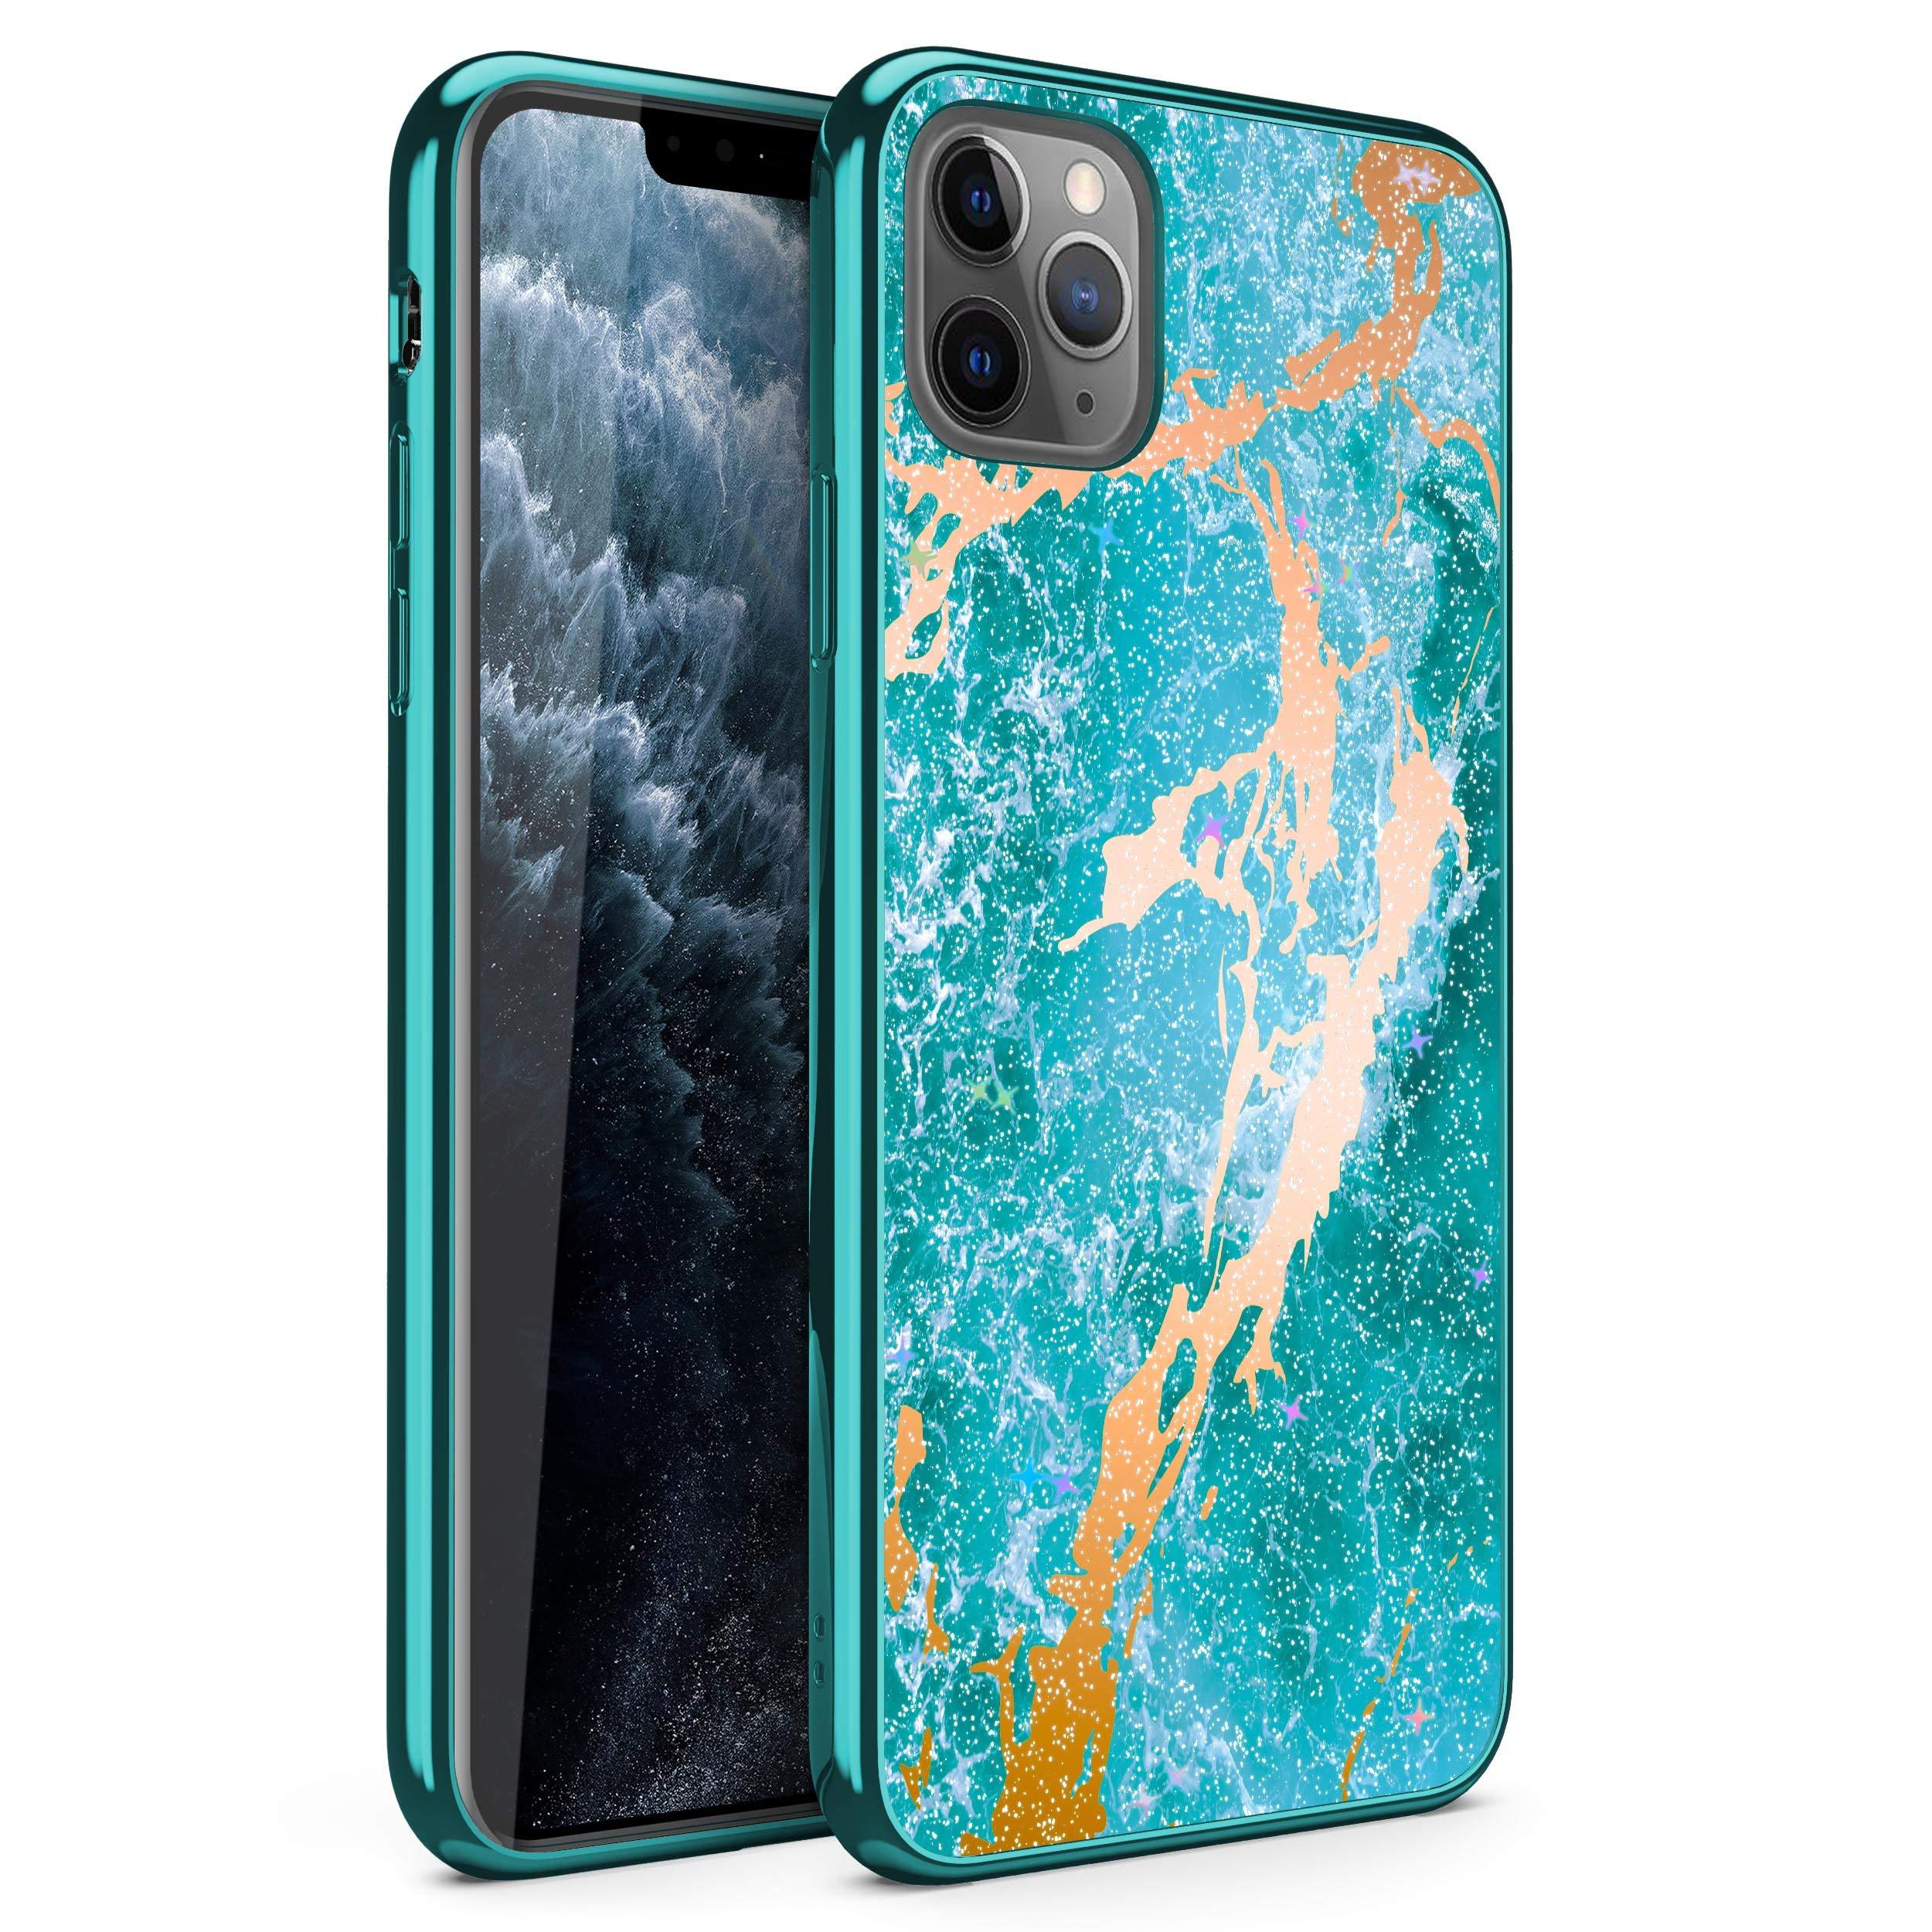 ZIZO Refine Series iPhone 11 Pro Case - Ultra Slim Thin Case - Oceanic